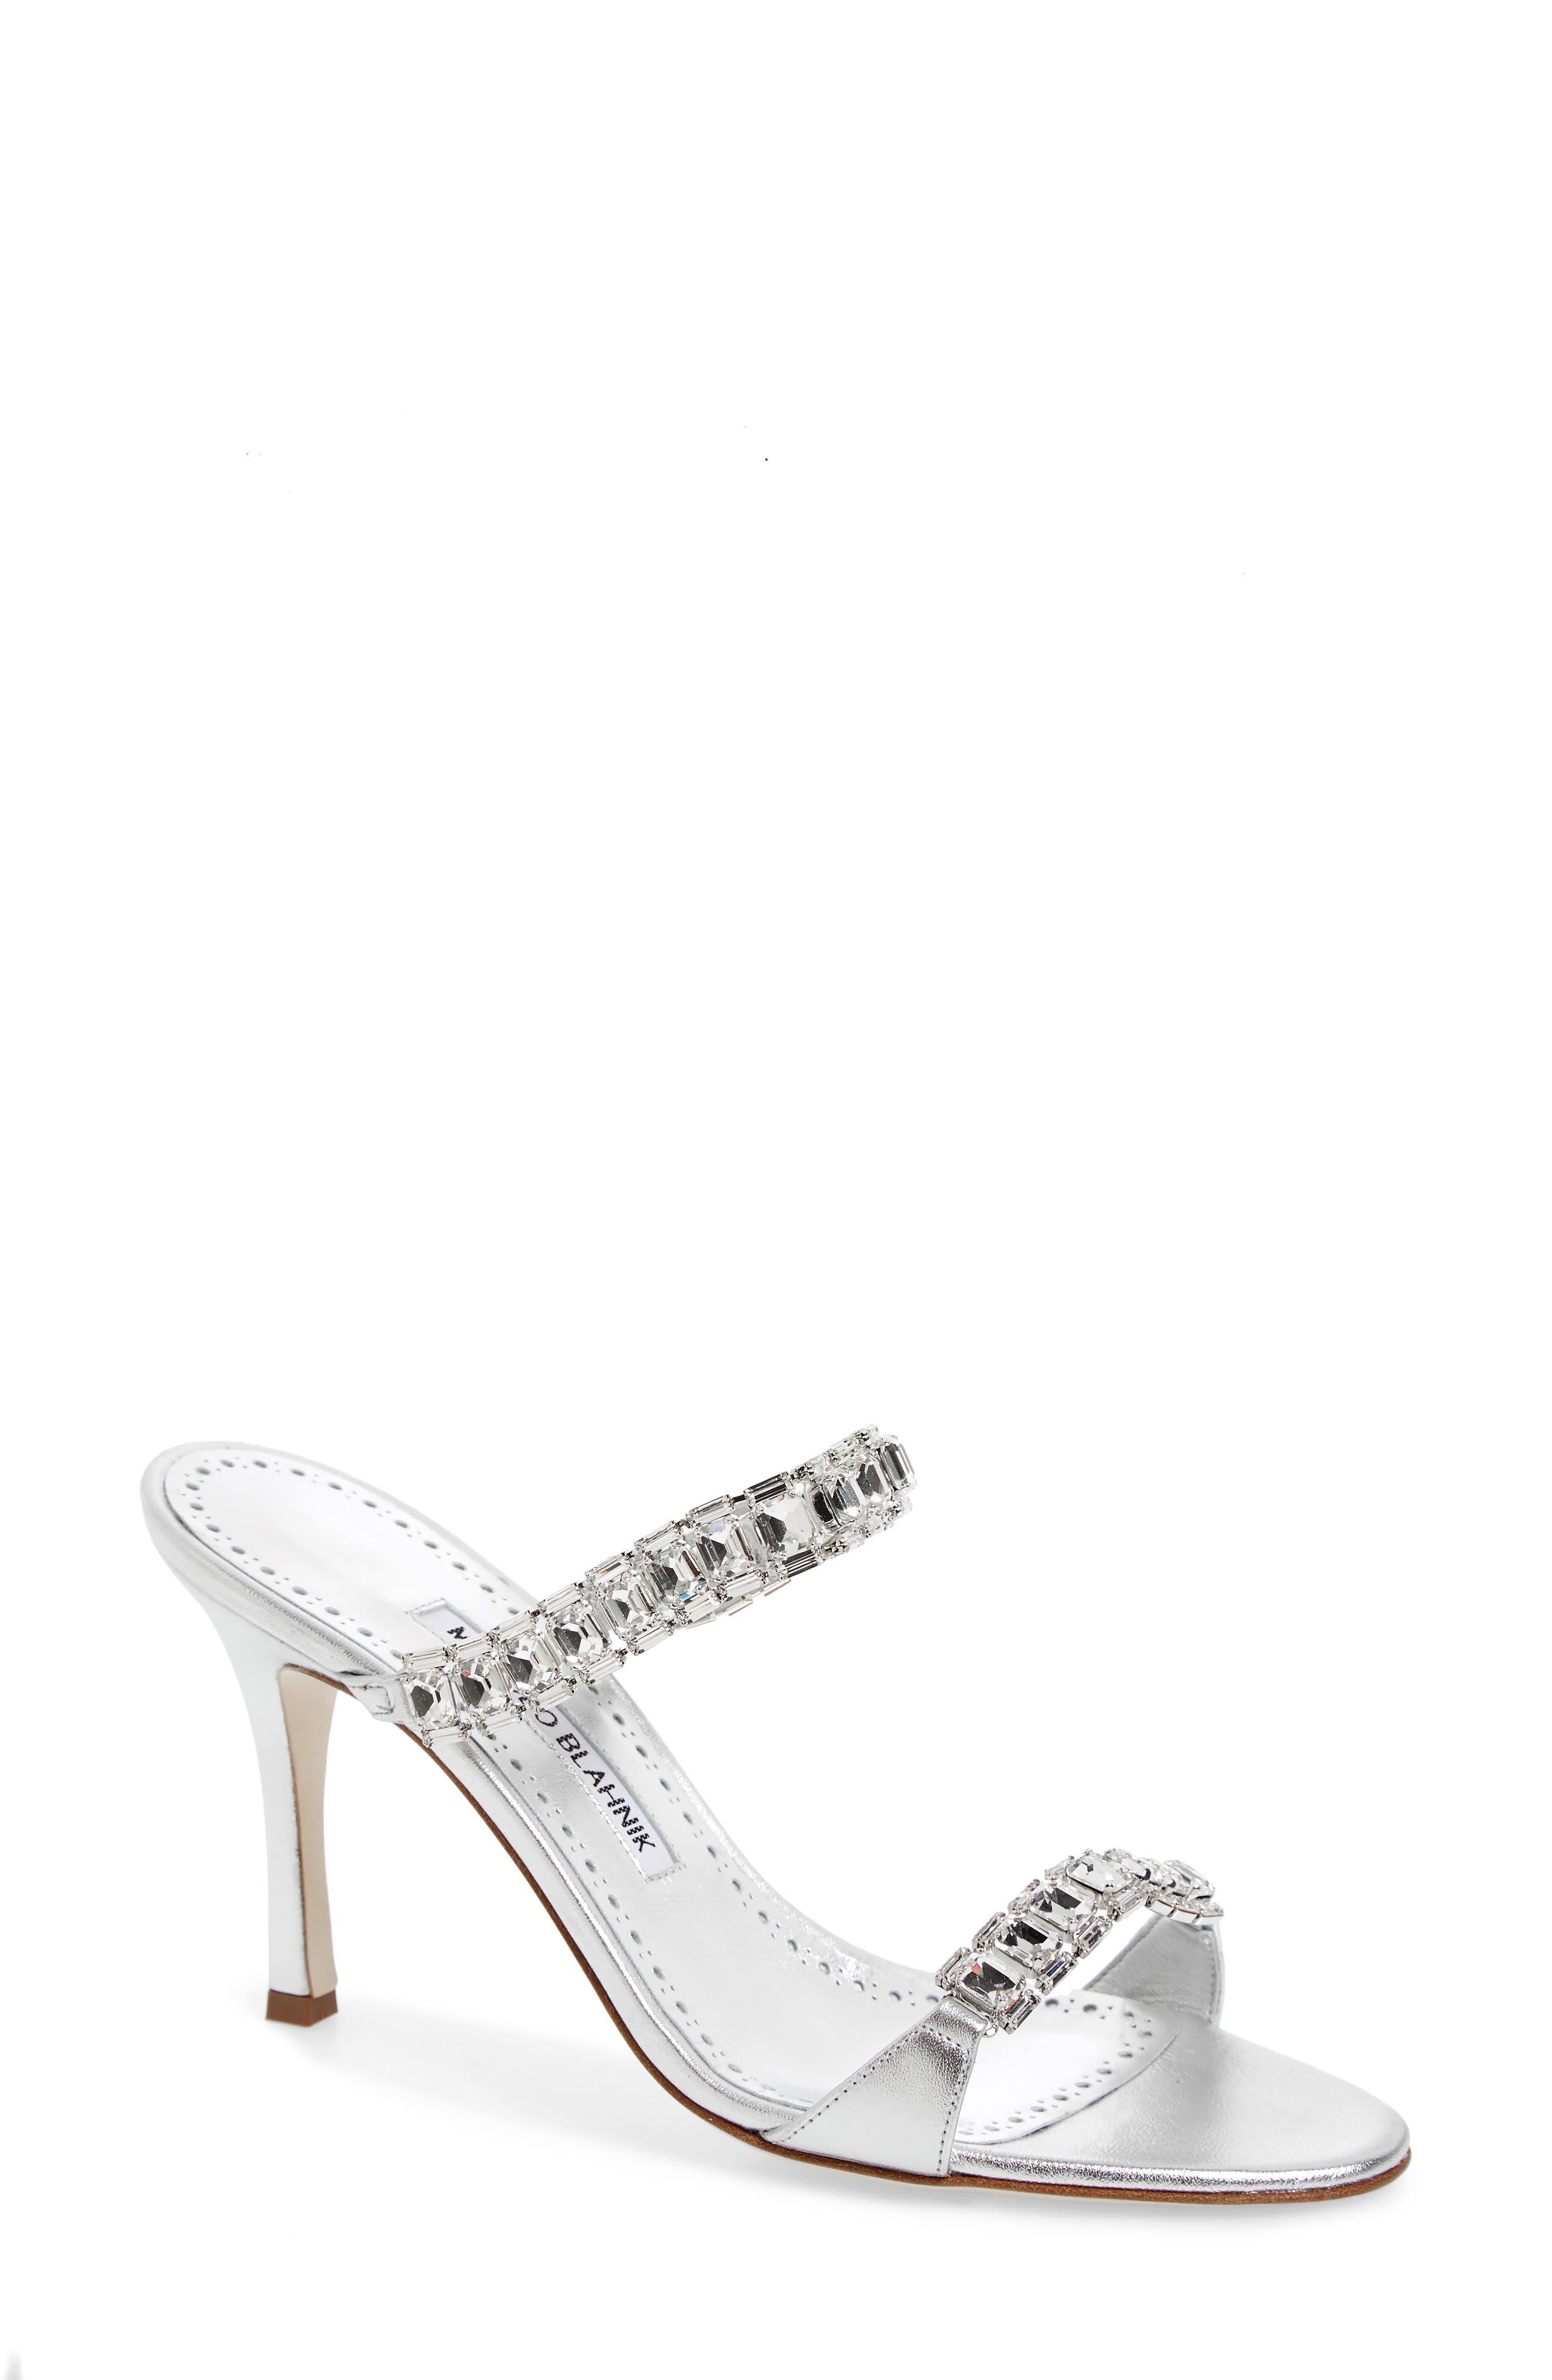 Dallifac Embellished Sandal,                             Main thumbnail 1, color,                             Silver